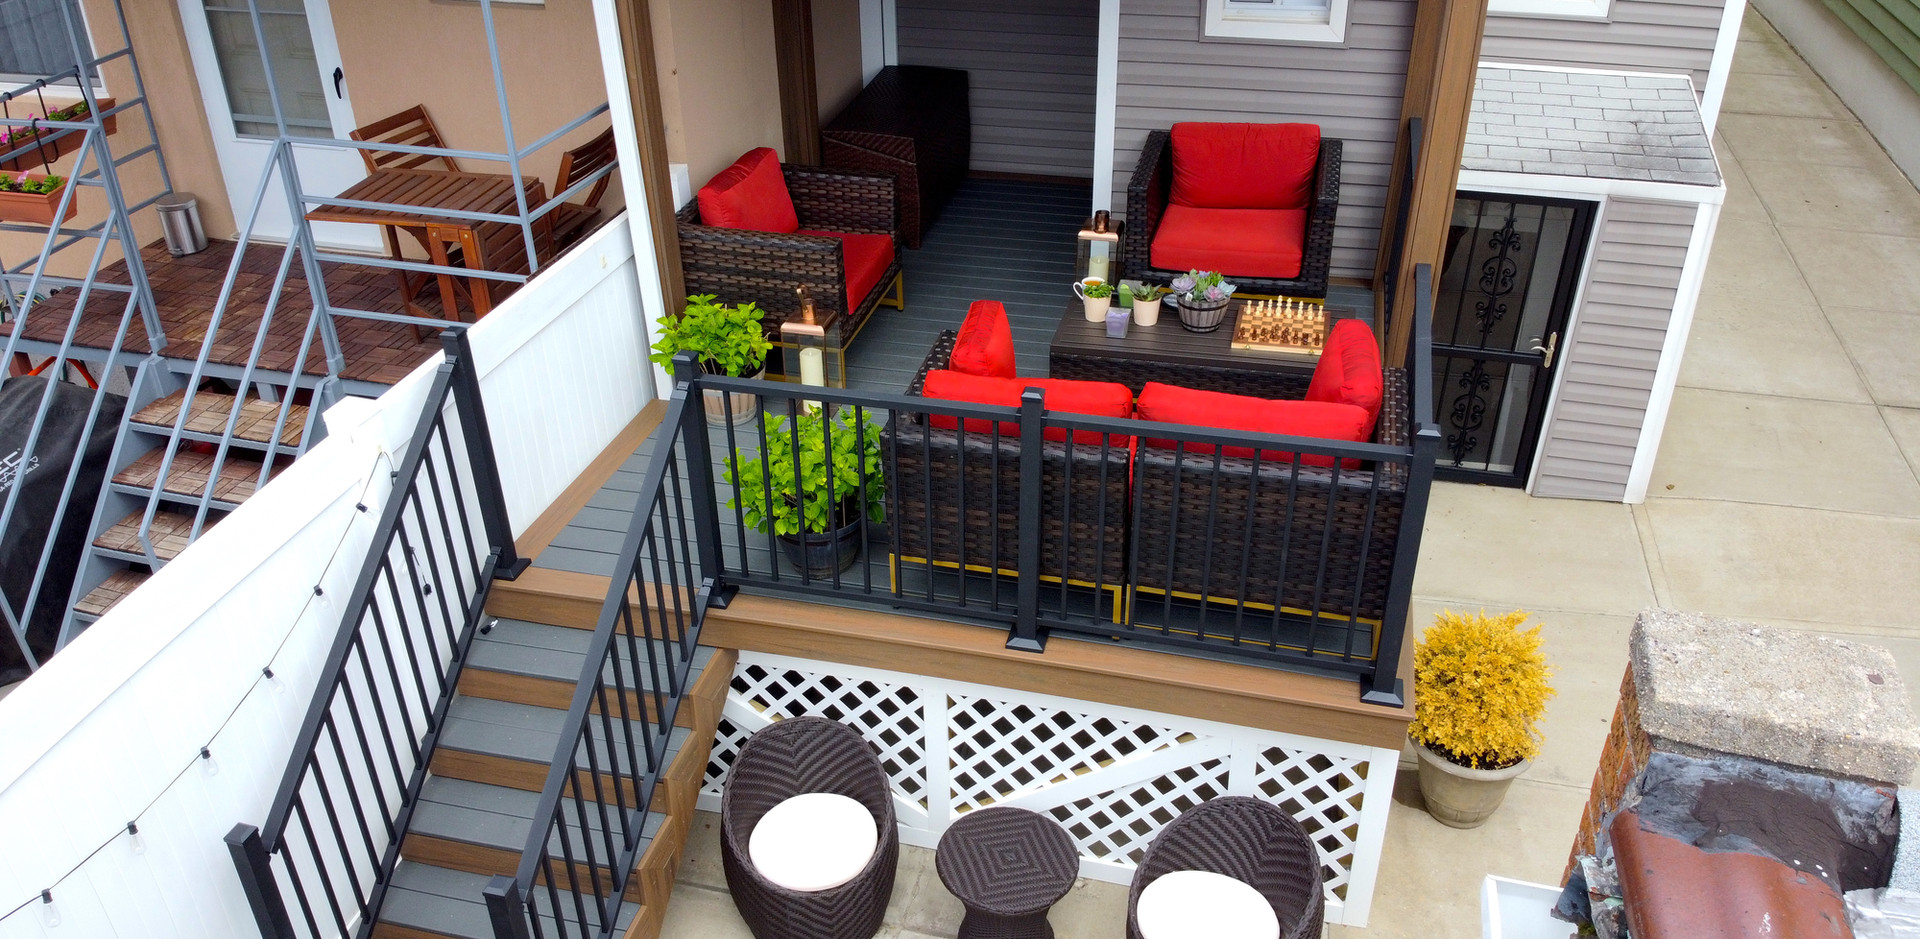 composite-rear-porch-makeover.JPG